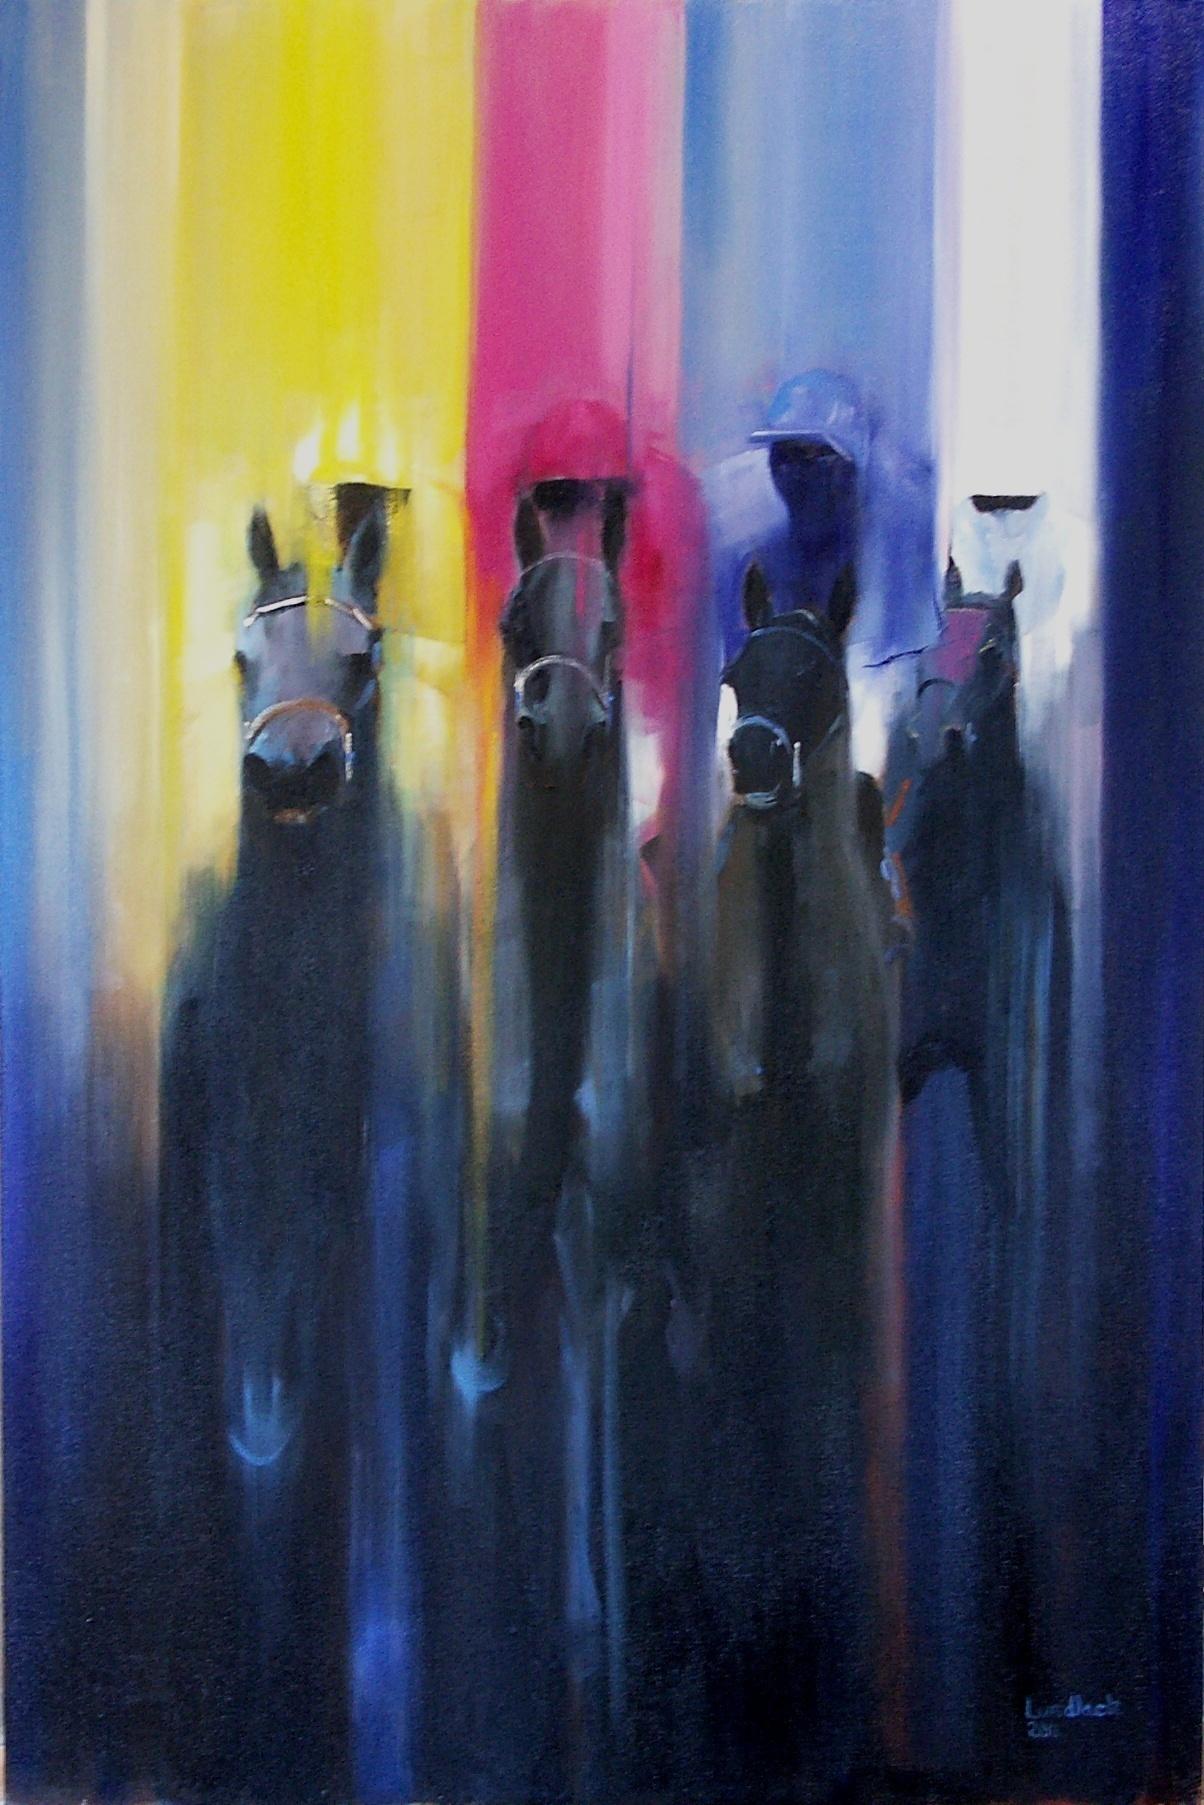 tom lund lack artwork primary colours original painting oil